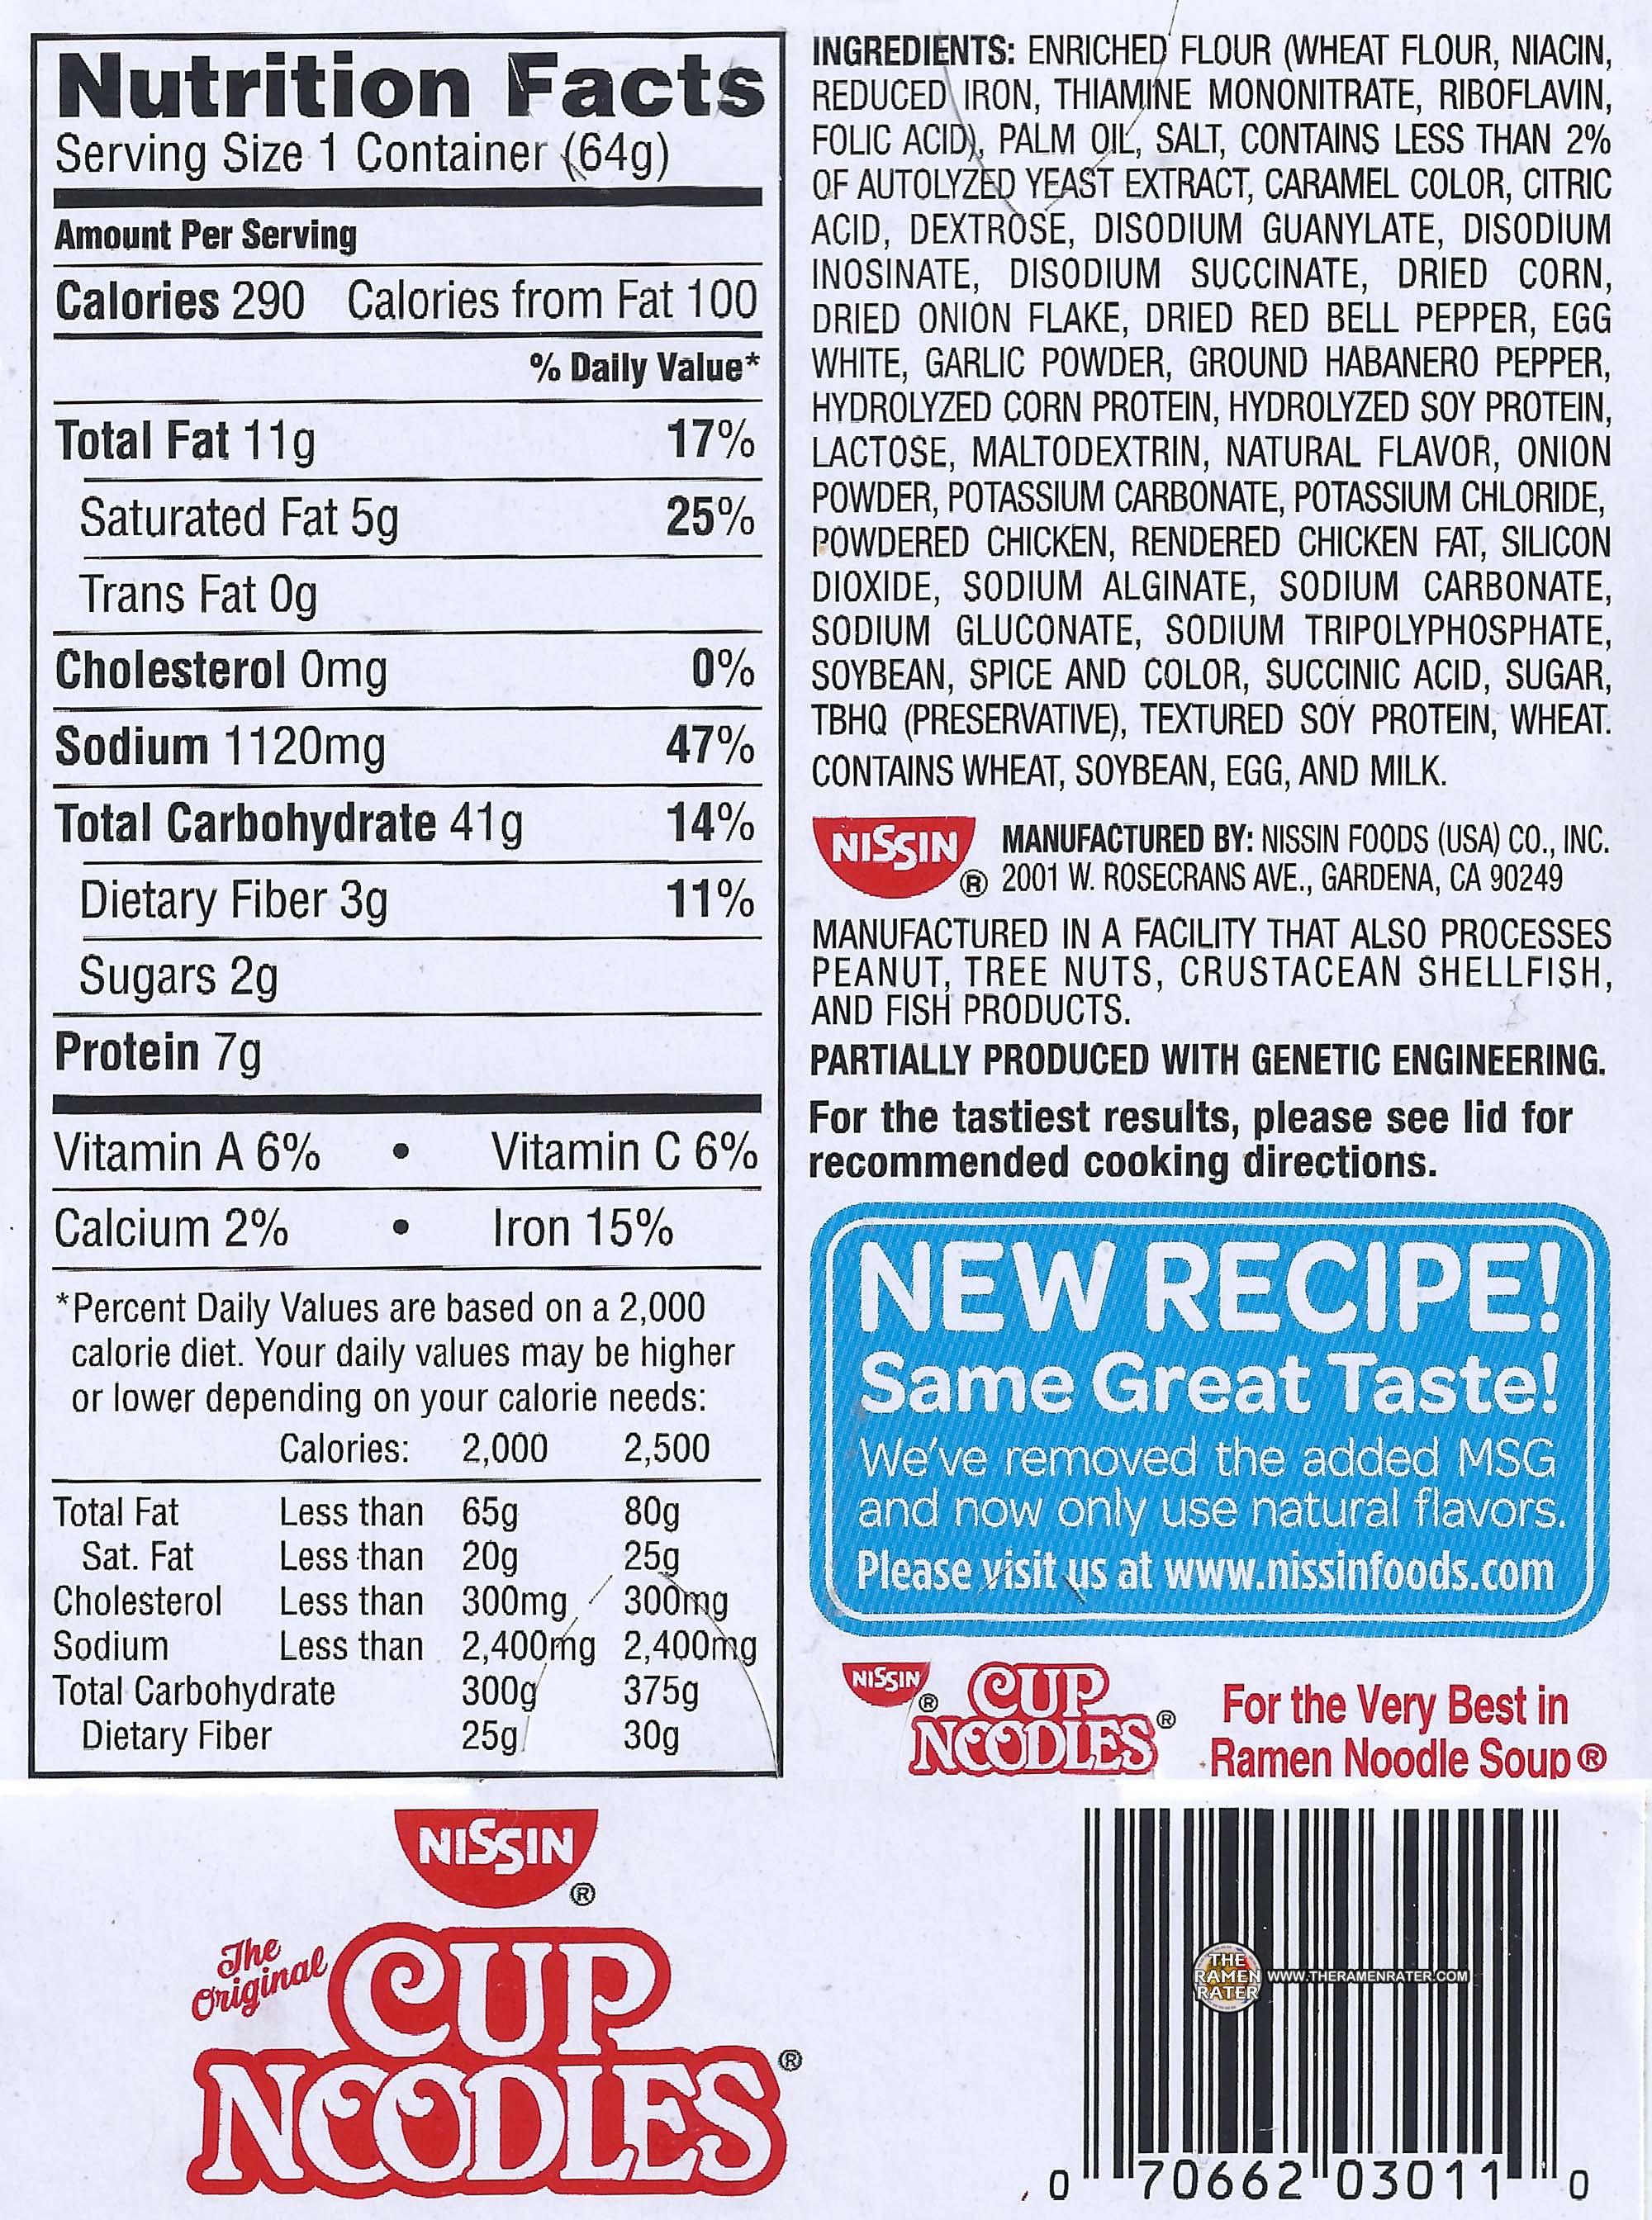 2298: nissin cup noodles spicy chile chicken flavor ramen noodle